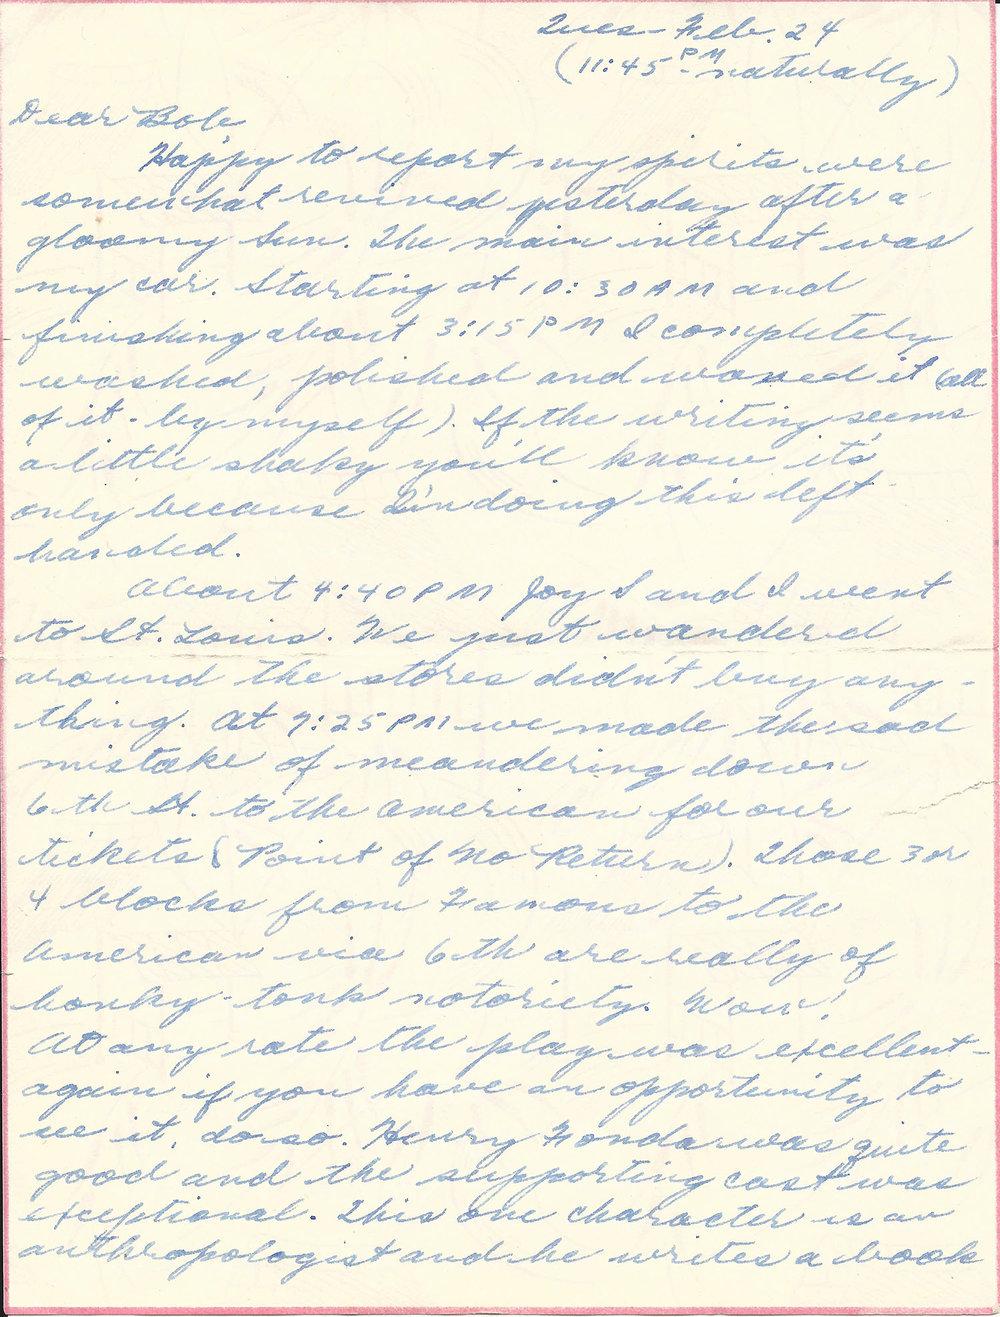 Feb. 24, 1953 (Marj), Page 1